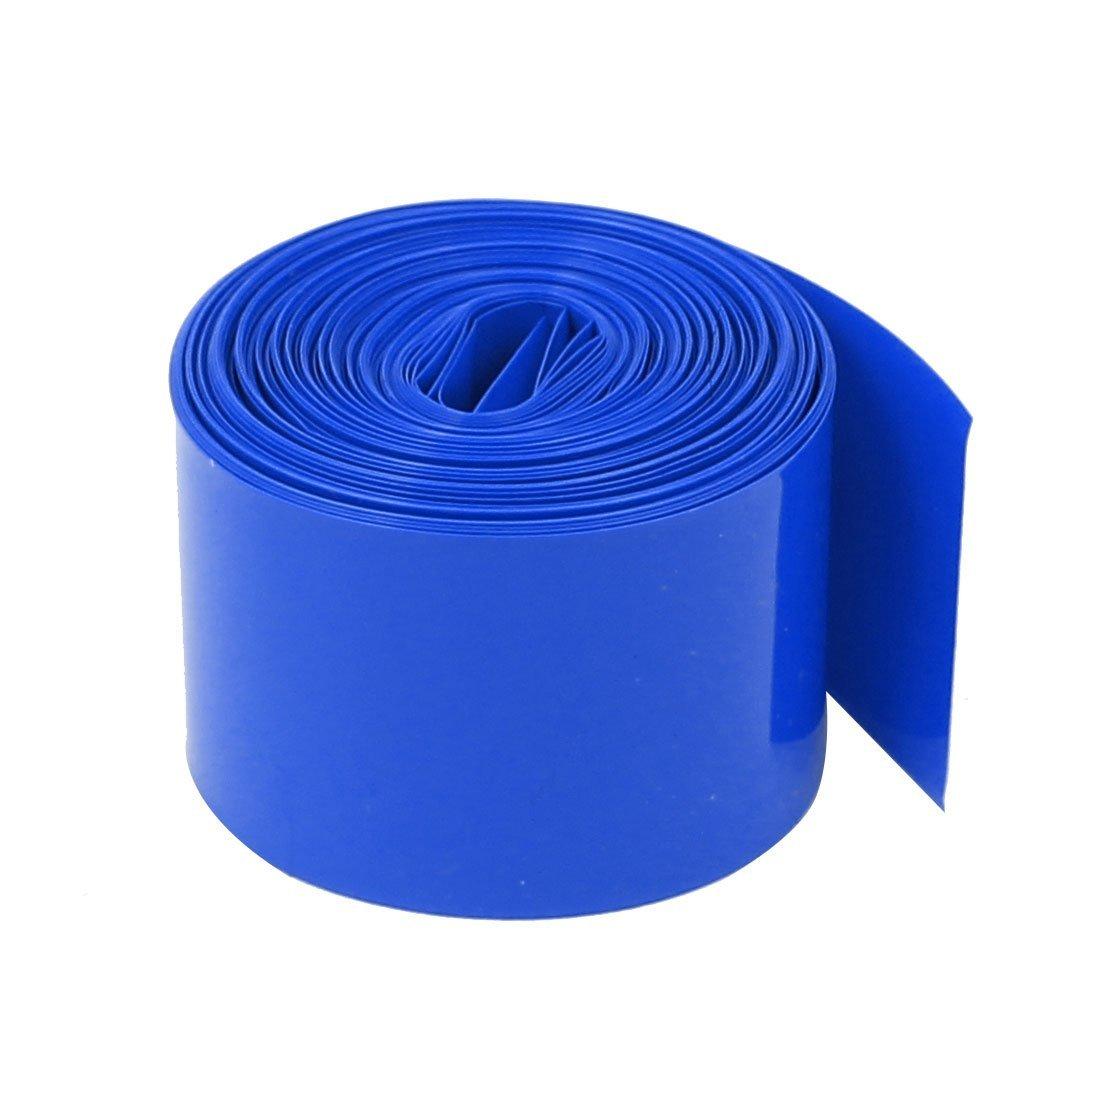 Othmro 75mm Flat Width 5.5m Length PVC Heat Shrink Tubing Blue for 18650 Battery Pack